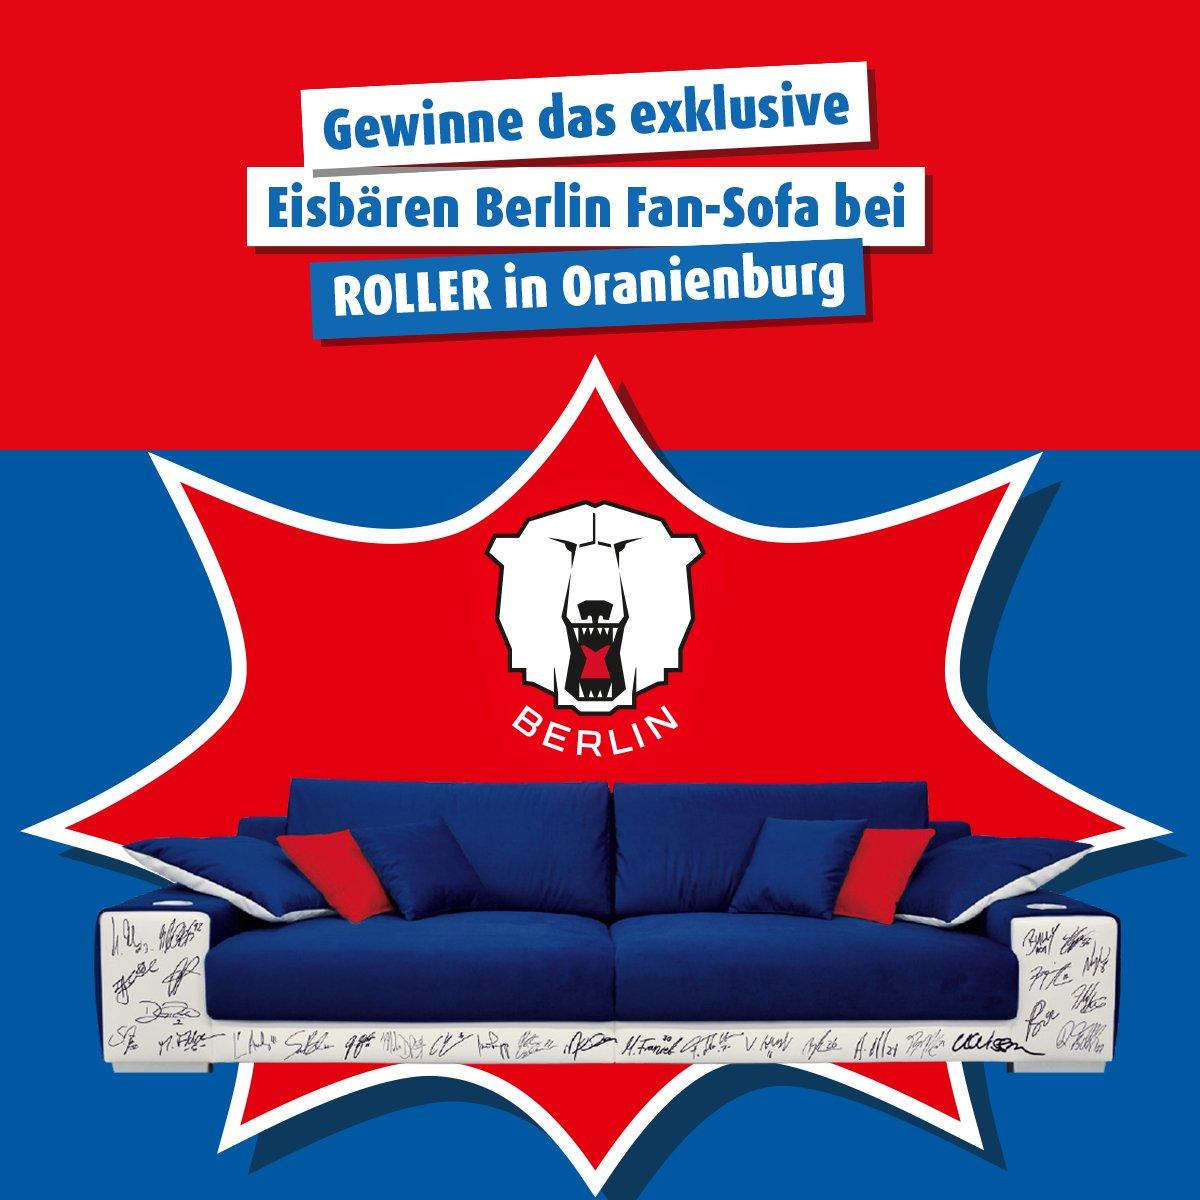 Eisbären Berlin On Twitter Eisbären Fans Aufgepasst Roller Möbel